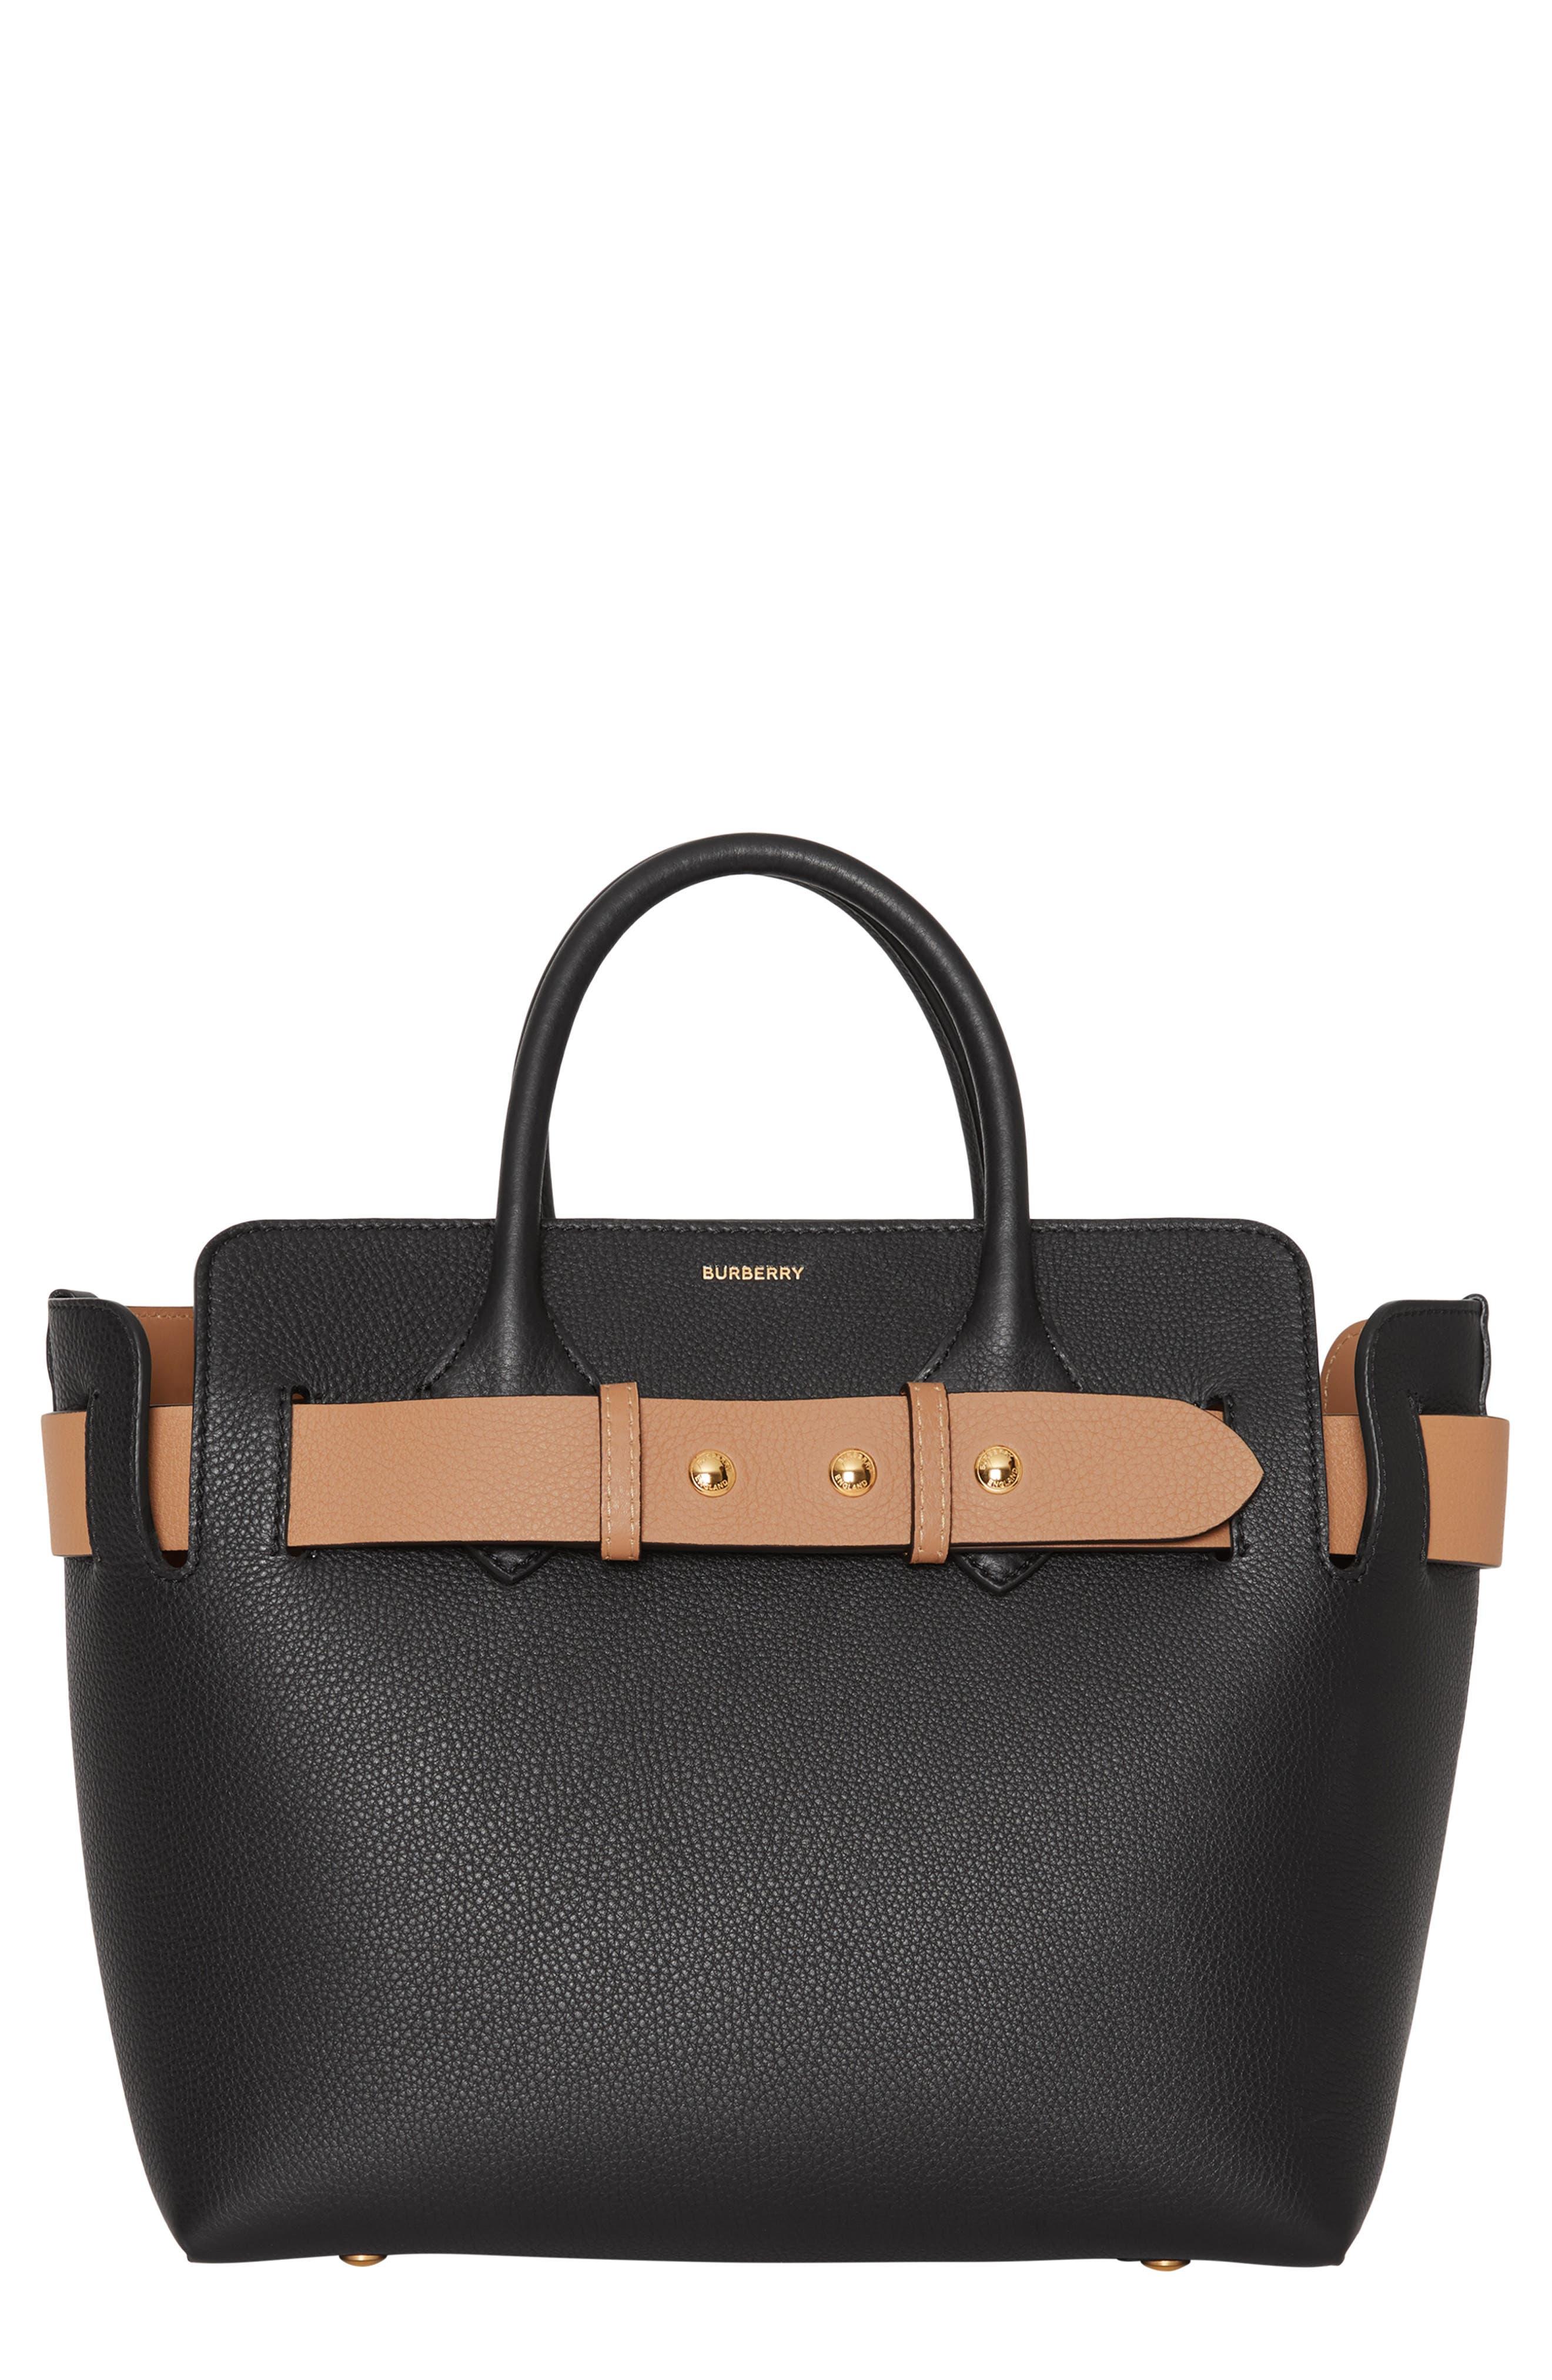 BURBERRY Small Belt Leather Satchel, Main, color, BLACK